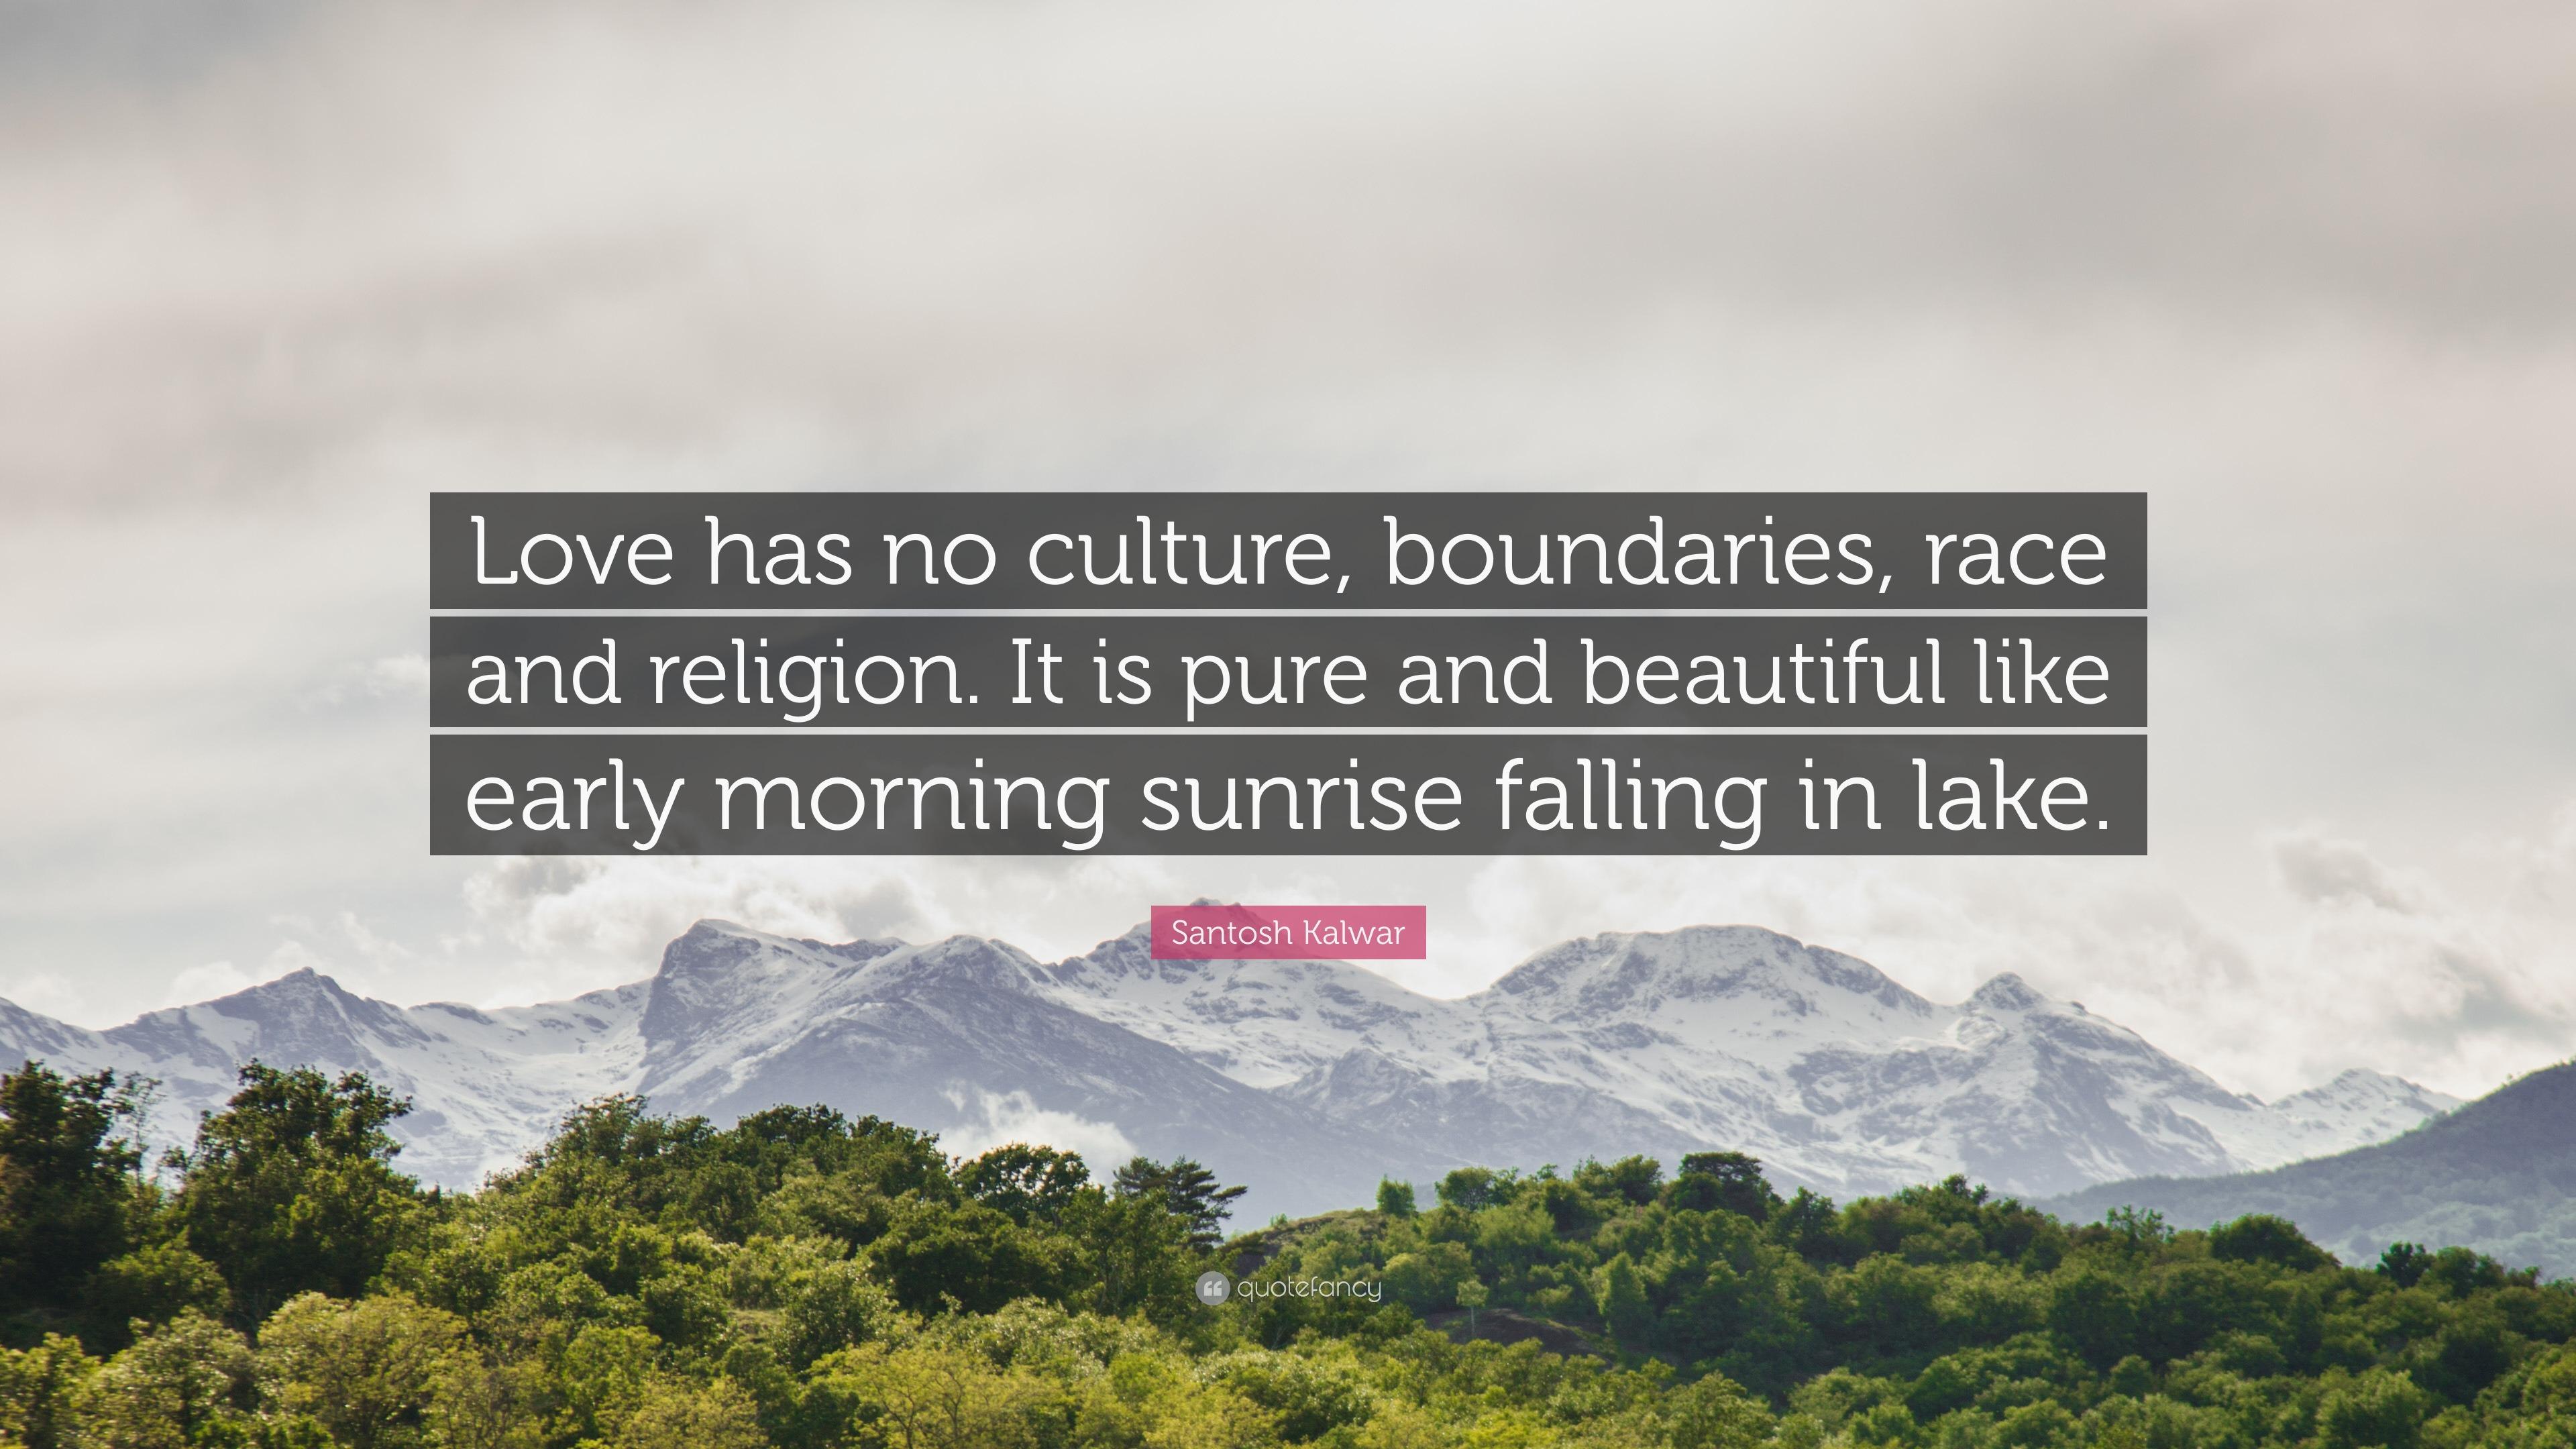 Santosh Kalwar Quote Love Has No Culture Boundaries Race And